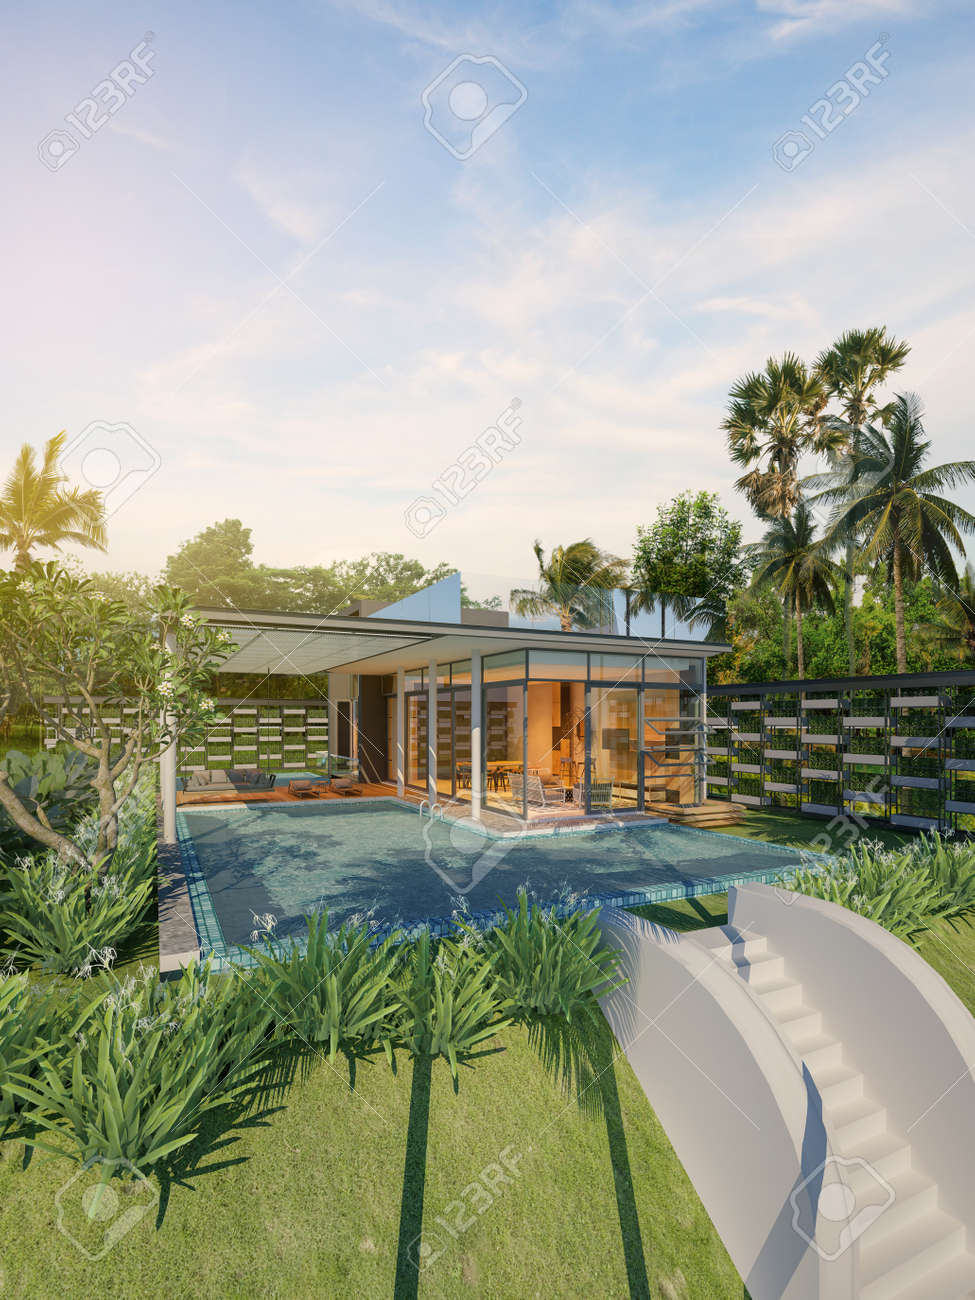 beautiful beach house pool villa on sea view 3d rendering stock rh 123rf com Beach House Paintings Beach House Blueprints